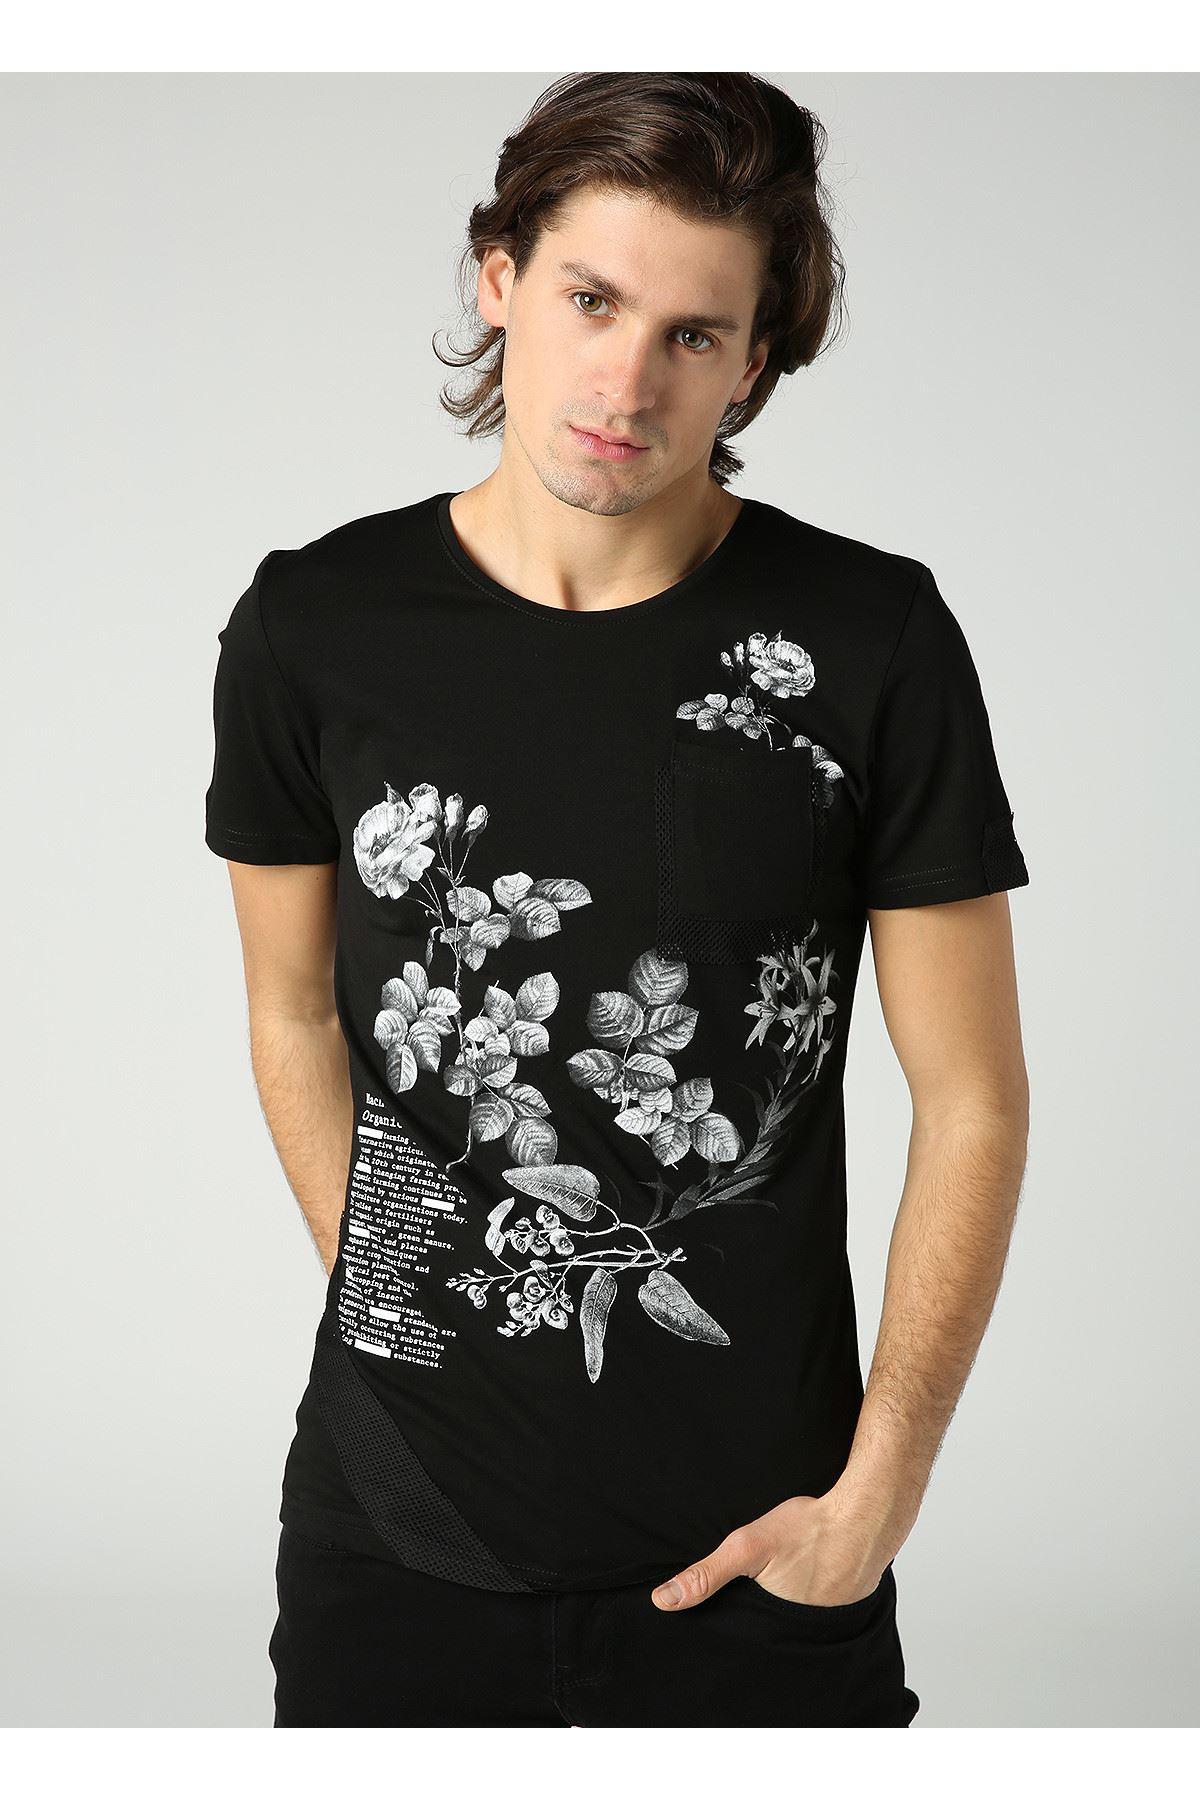 Bisiklet Yaka Çiçek Baskılı Cep Detay Erkek Siyah T-Shirt